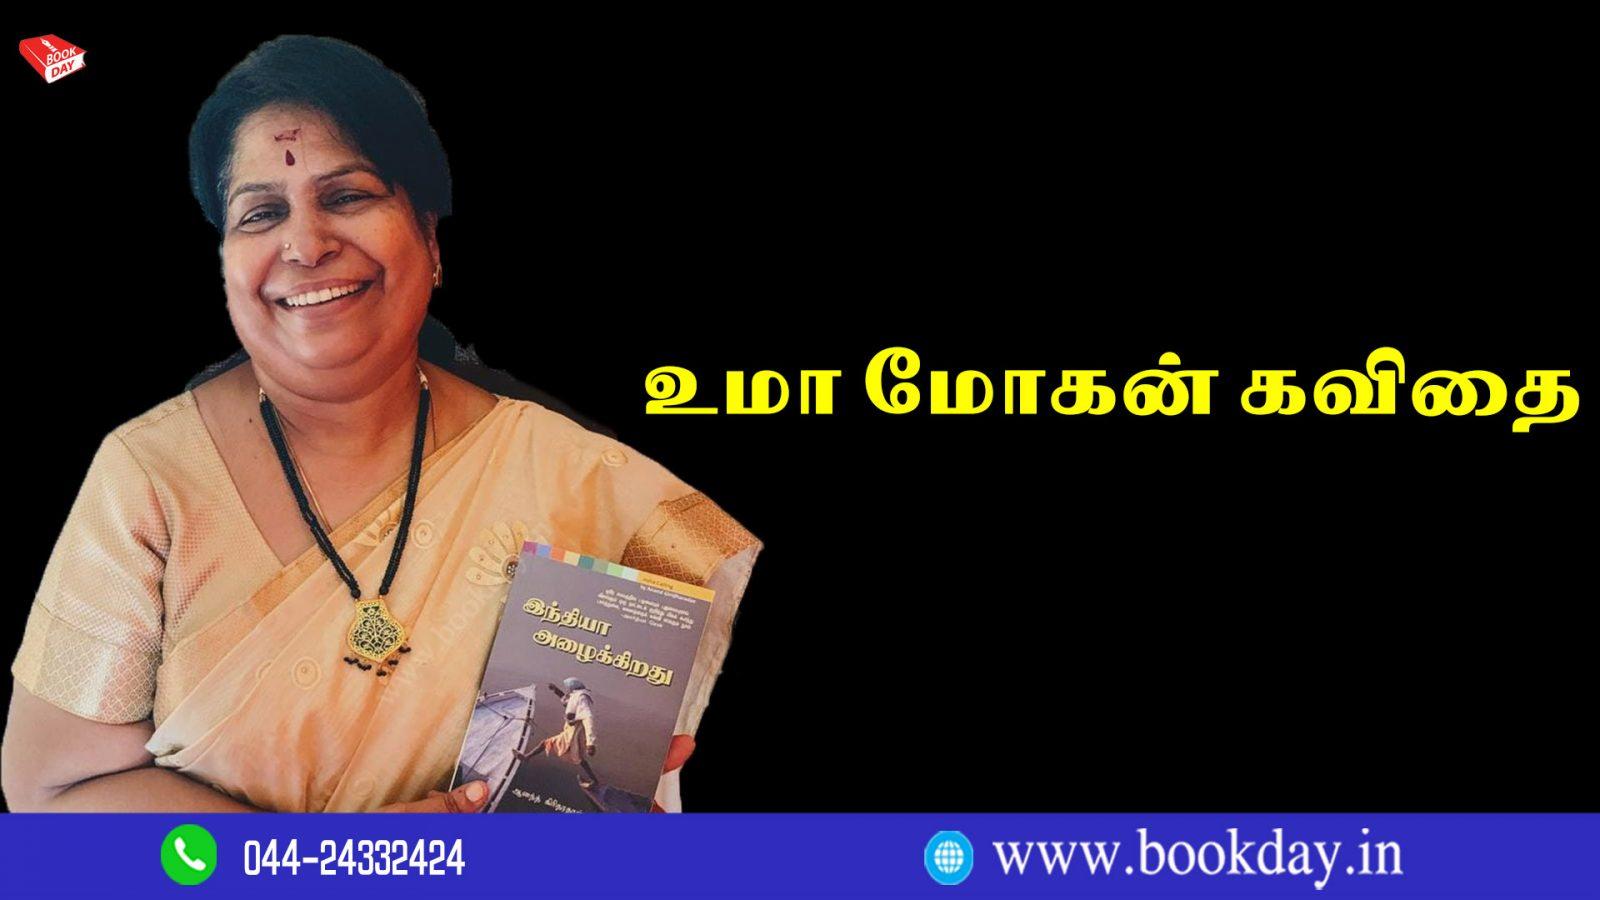 Uma Mohan Poetry in Tamil Language. Book Day is Branch of Bharathi Puthakalayam. உமா மோகன் கவிதை